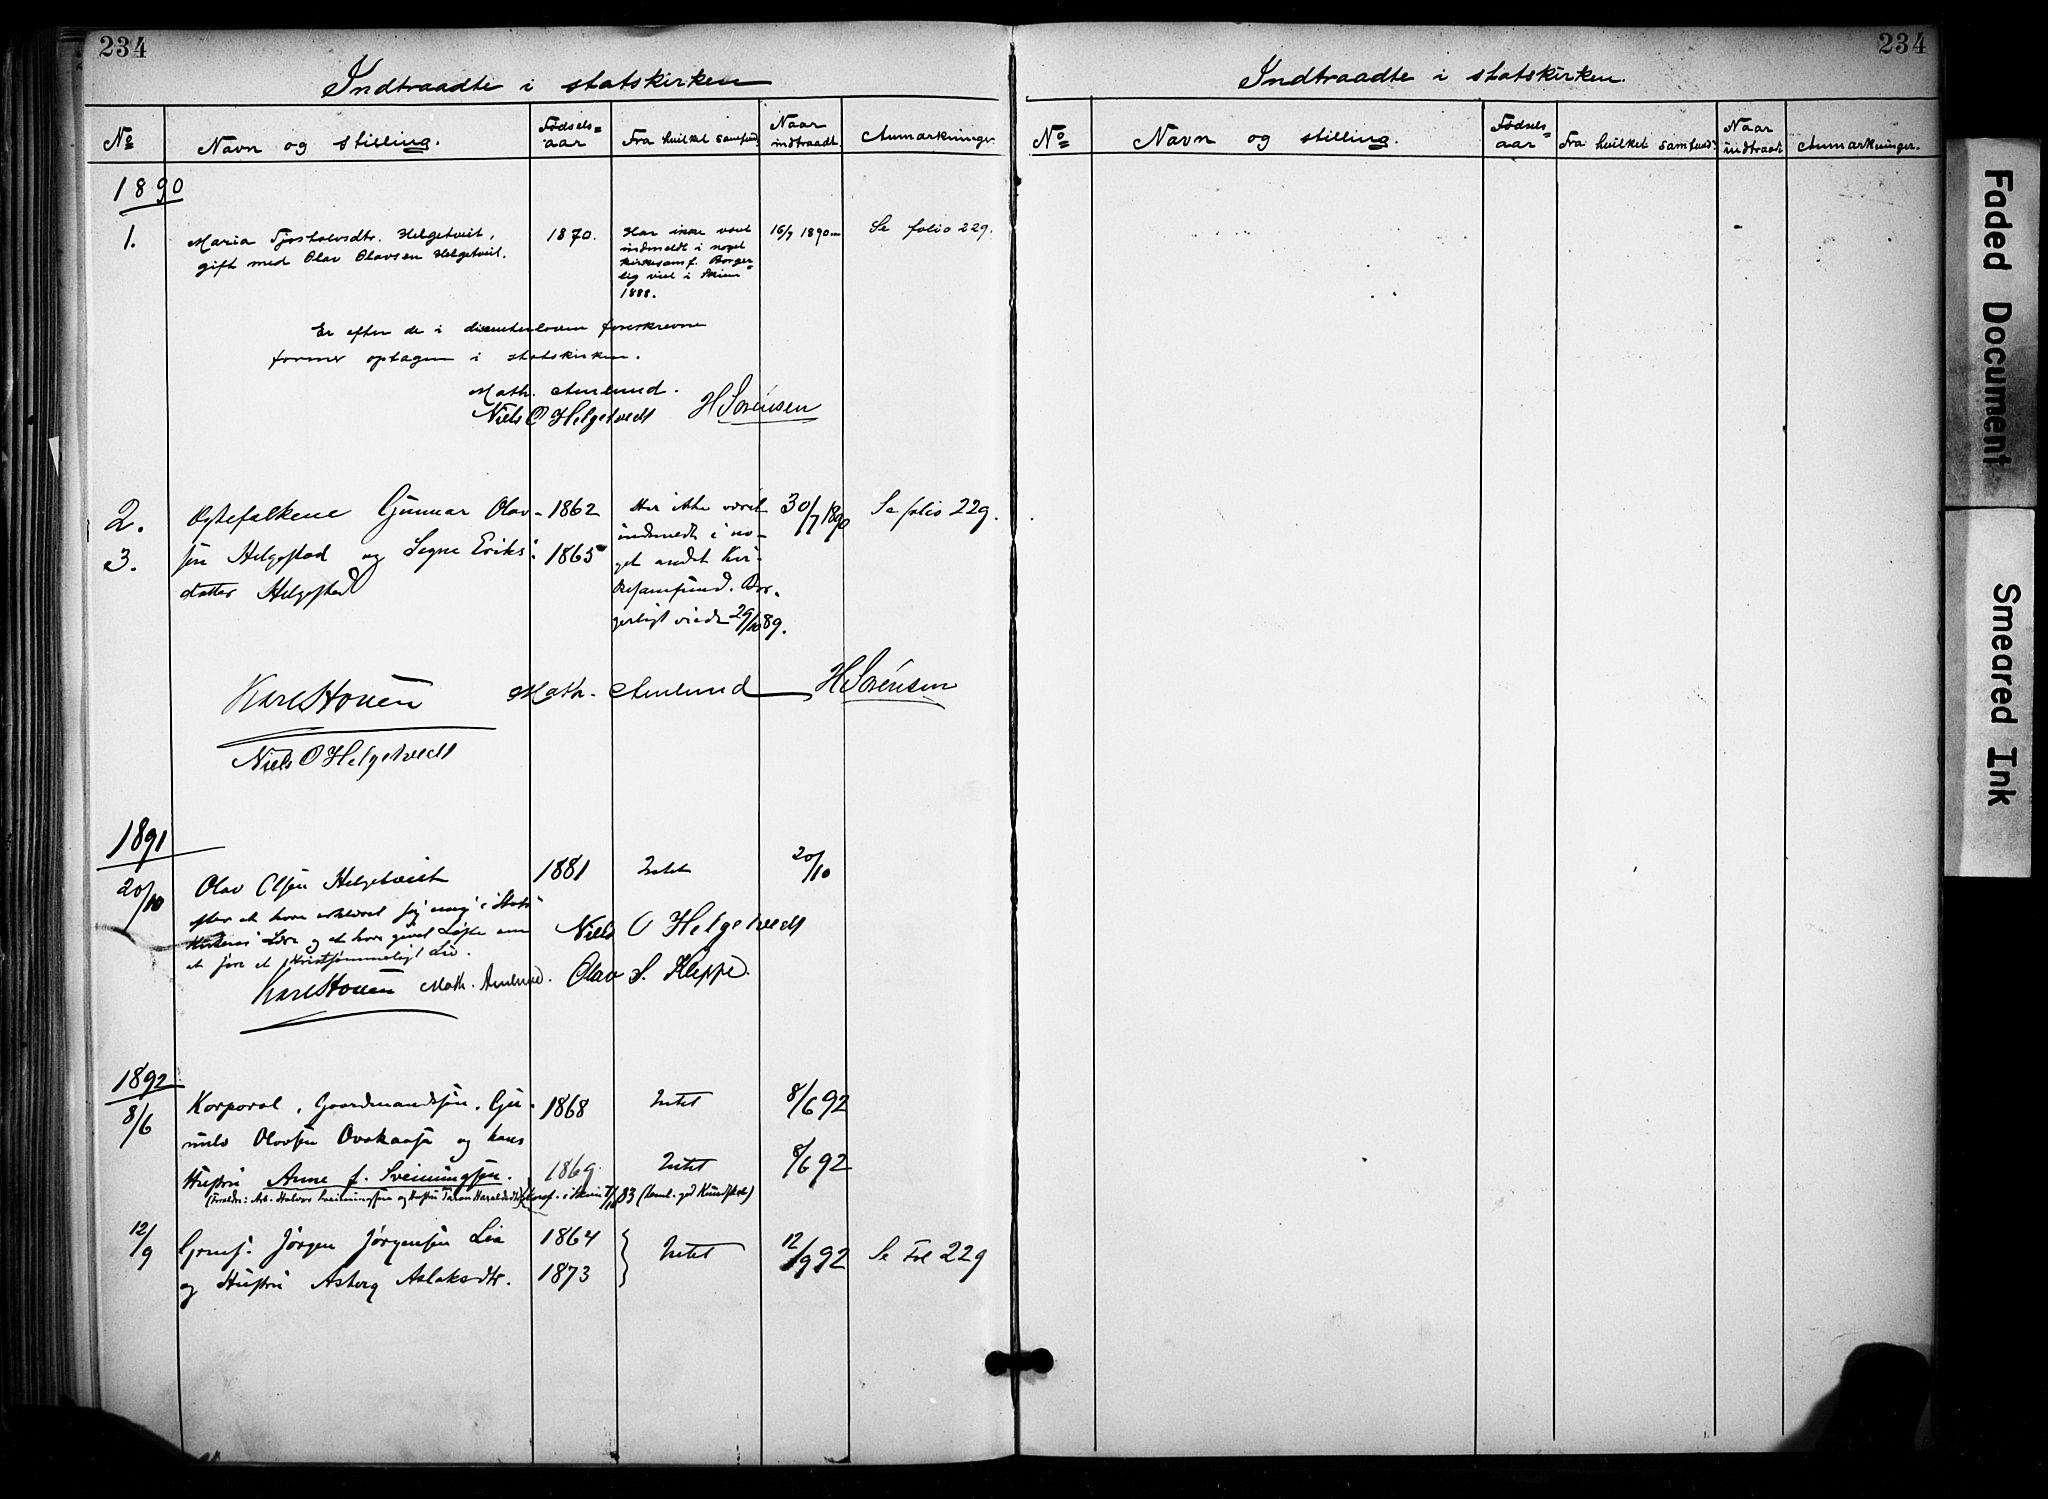 SAKO, Lunde kirkebøker, F/Fa/L0002: Ministerialbok nr. I 2, 1884-1892, s. 234